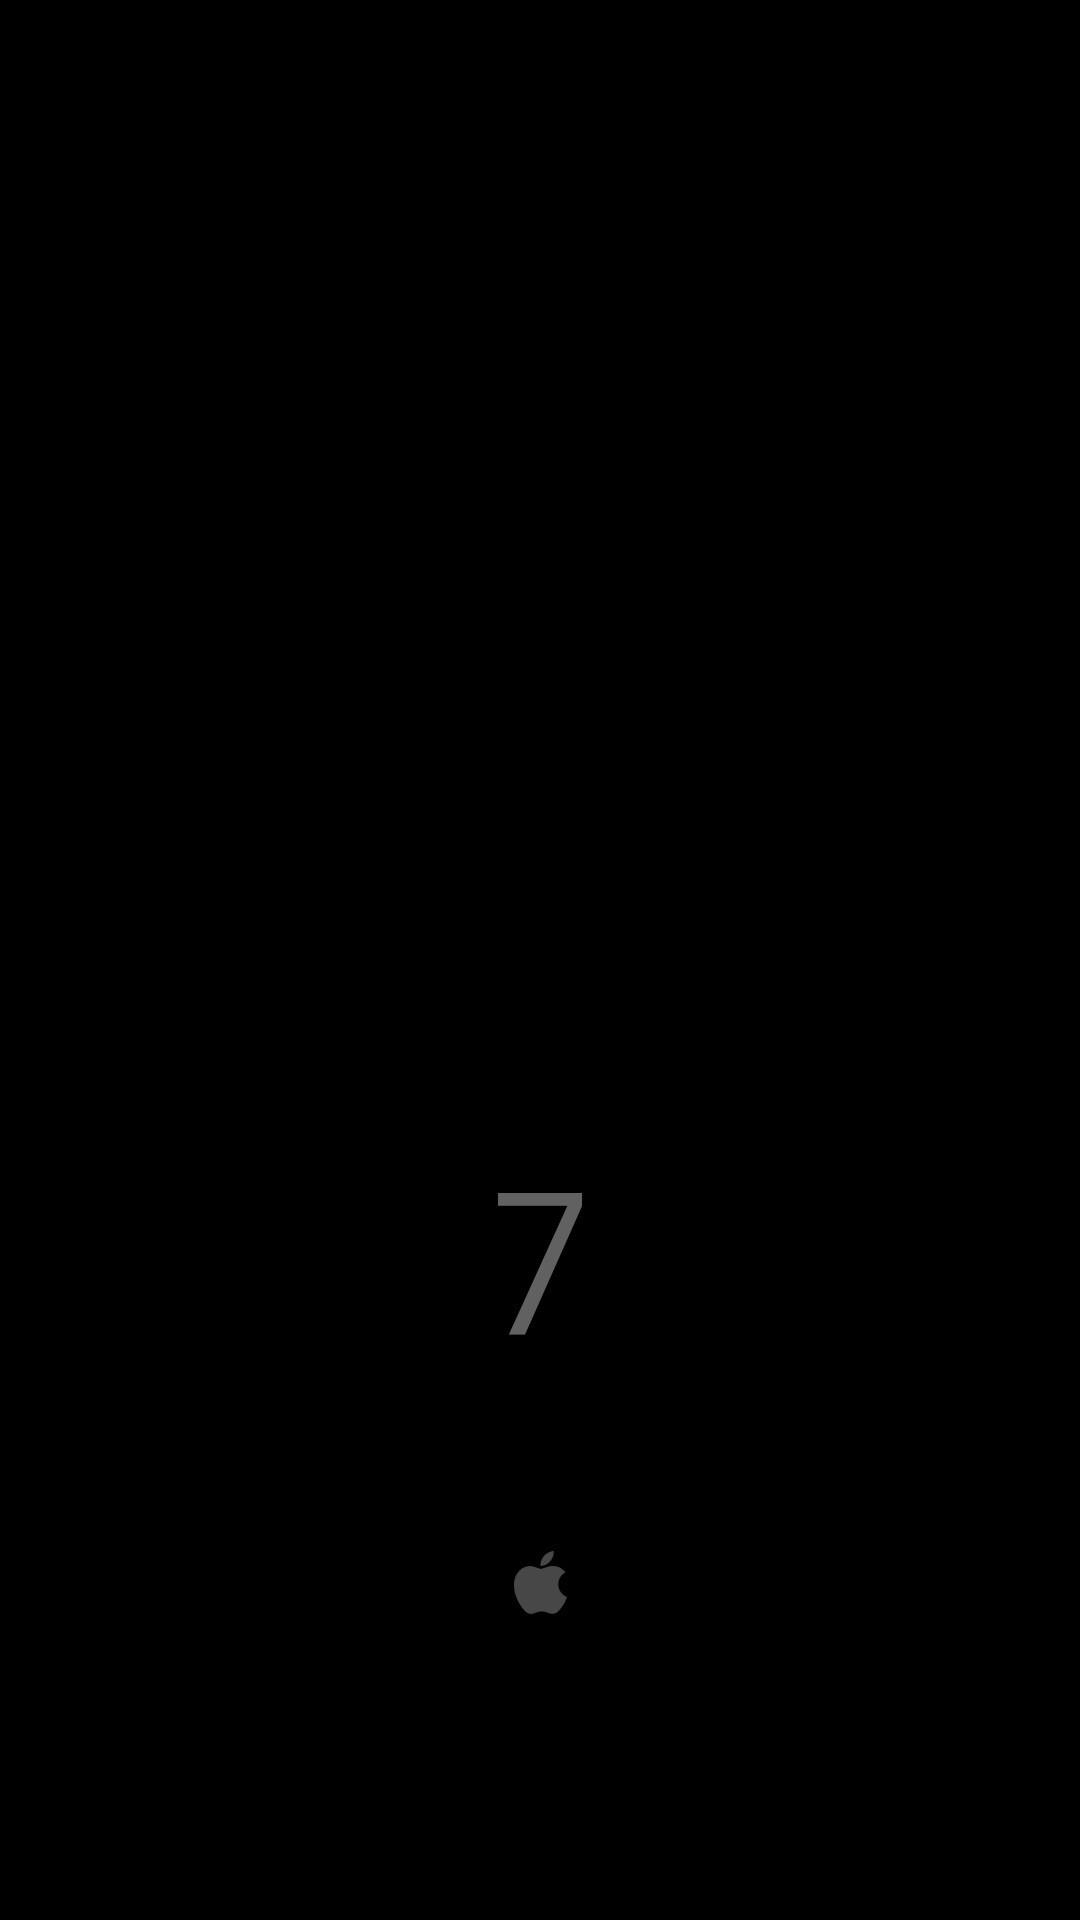 Apple Wallpaper, Iphone Wallpaper, Apple Logo, Iphone 7